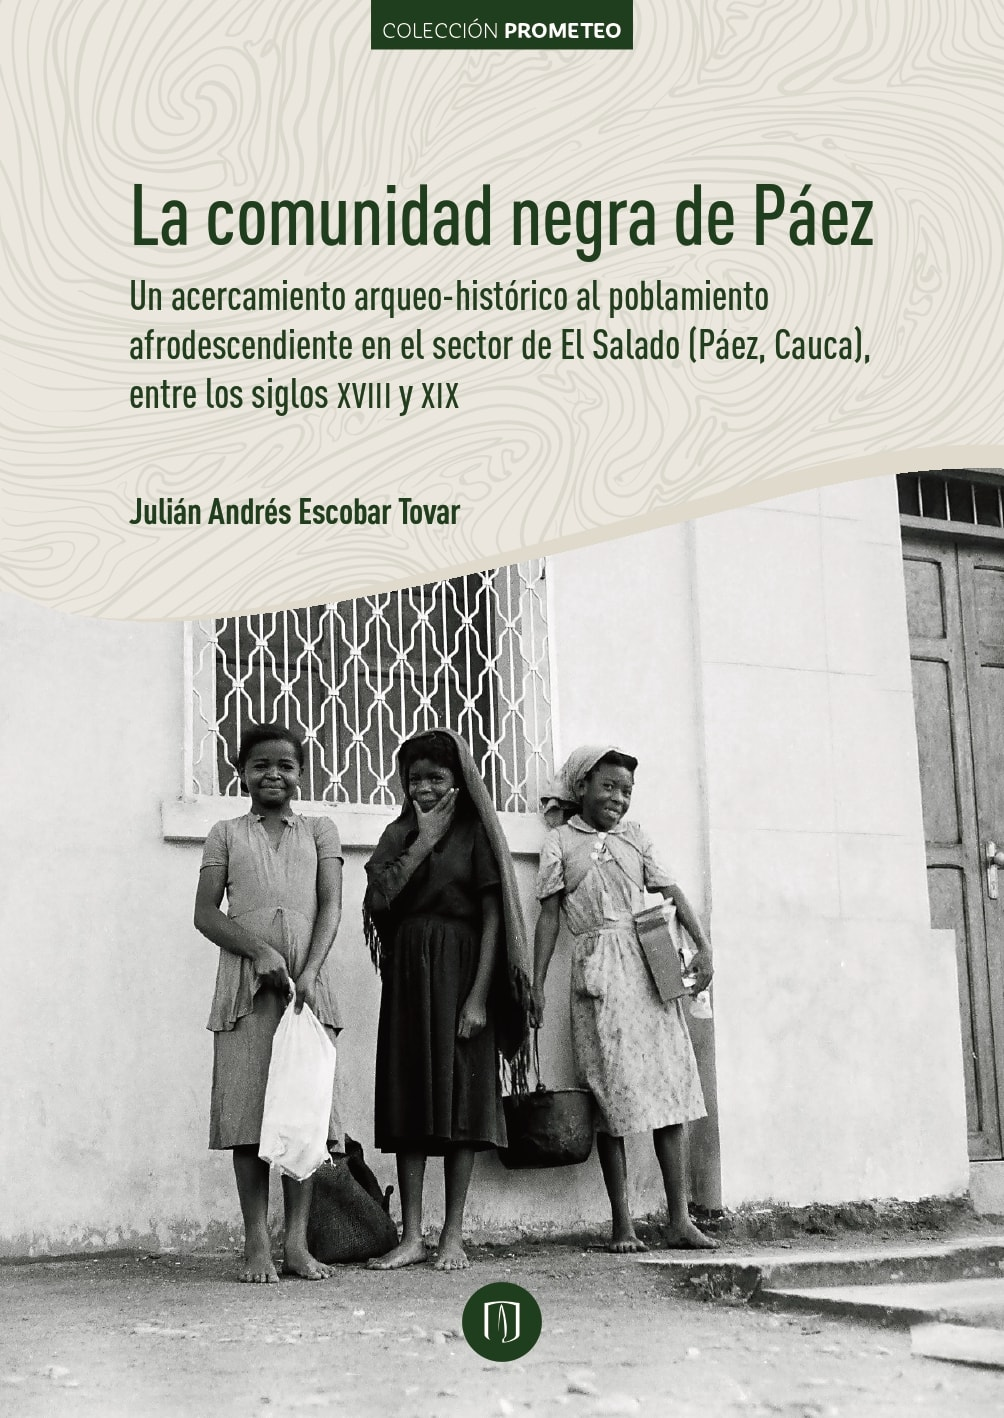 Portada del libro La comunidad negra de Páez